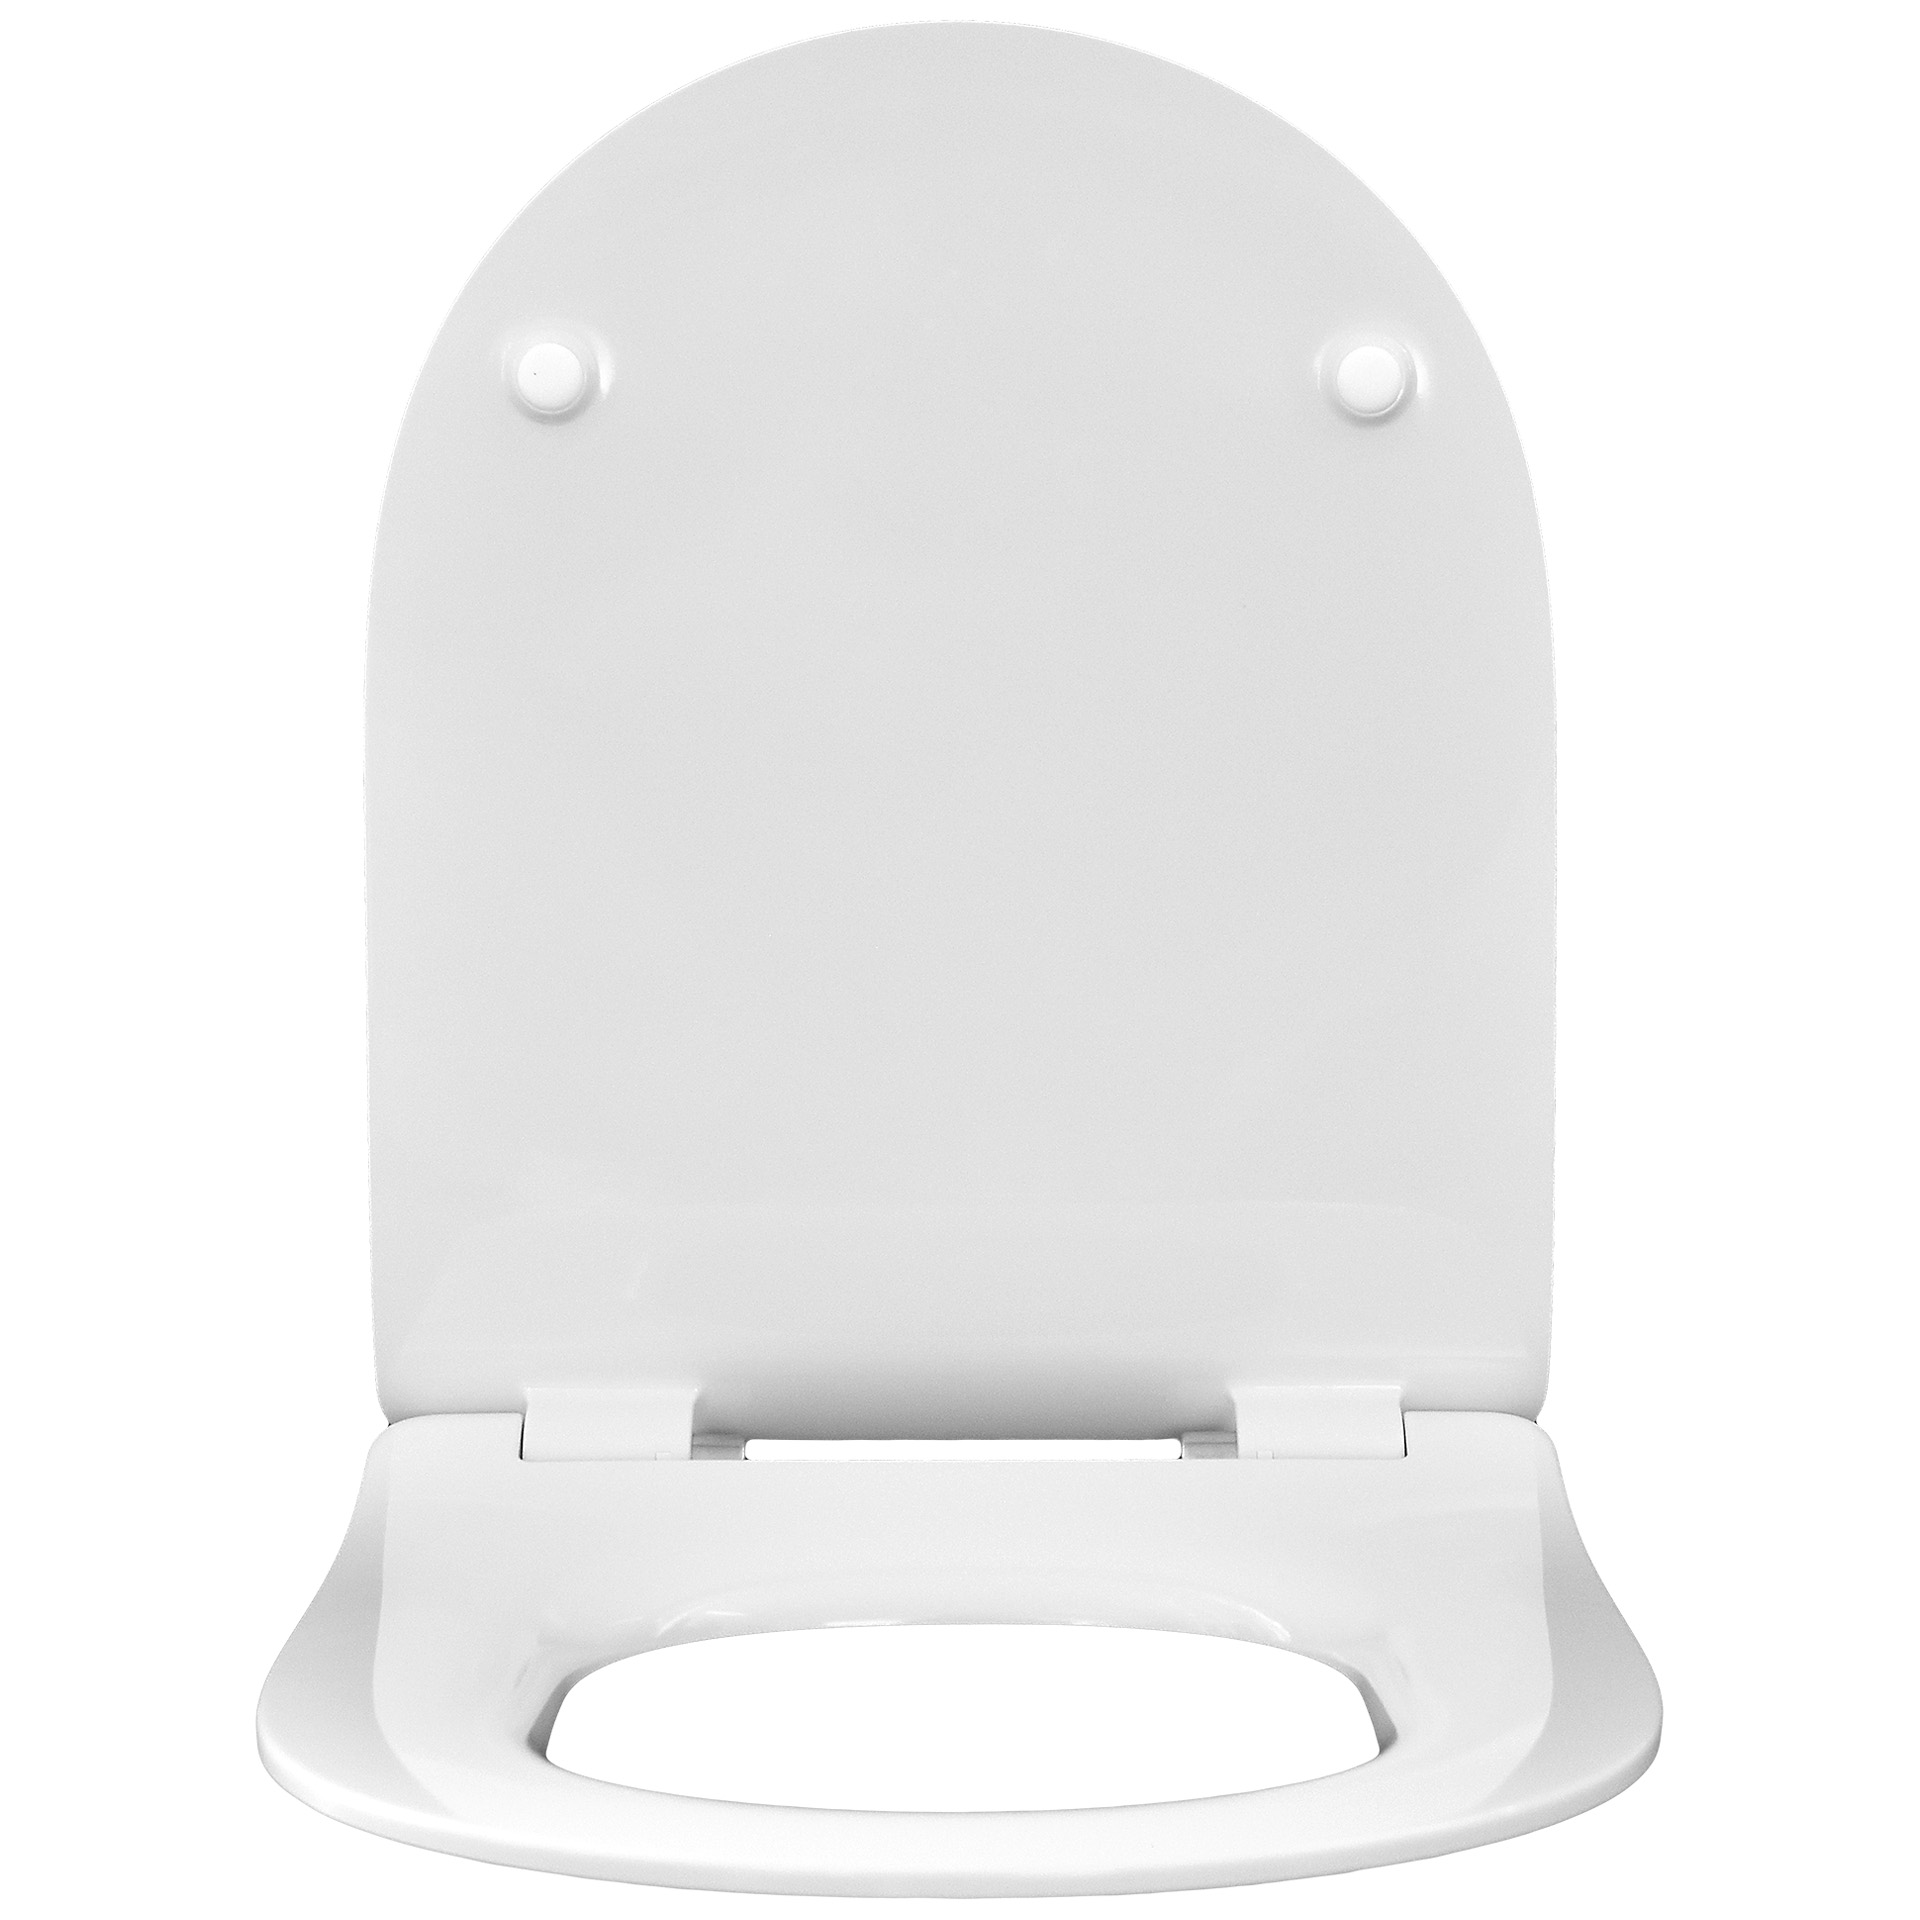 wc sitz harmony slim wc sitz slim wc sitze temtasi preiswerte dusch wcs ohne. Black Bedroom Furniture Sets. Home Design Ideas